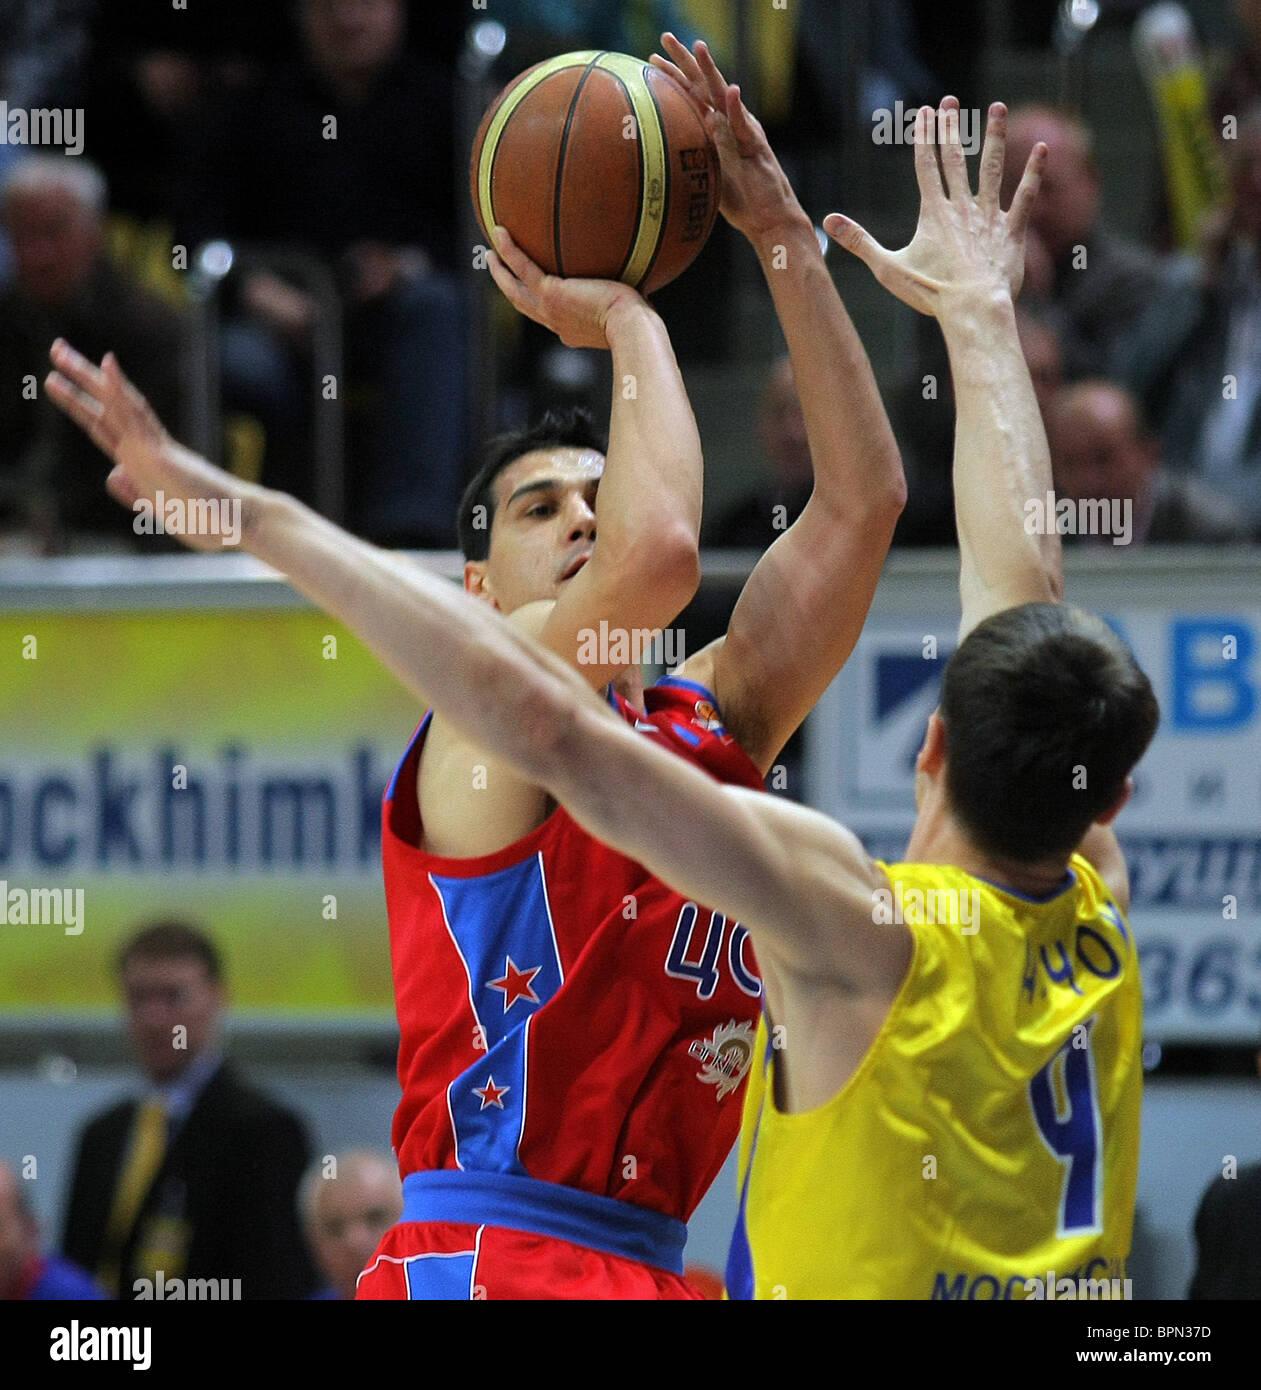 Finale du championnat de basket-ball russe: CSKA Moscou 78-45 Khimki Moscow Region Photo Stock